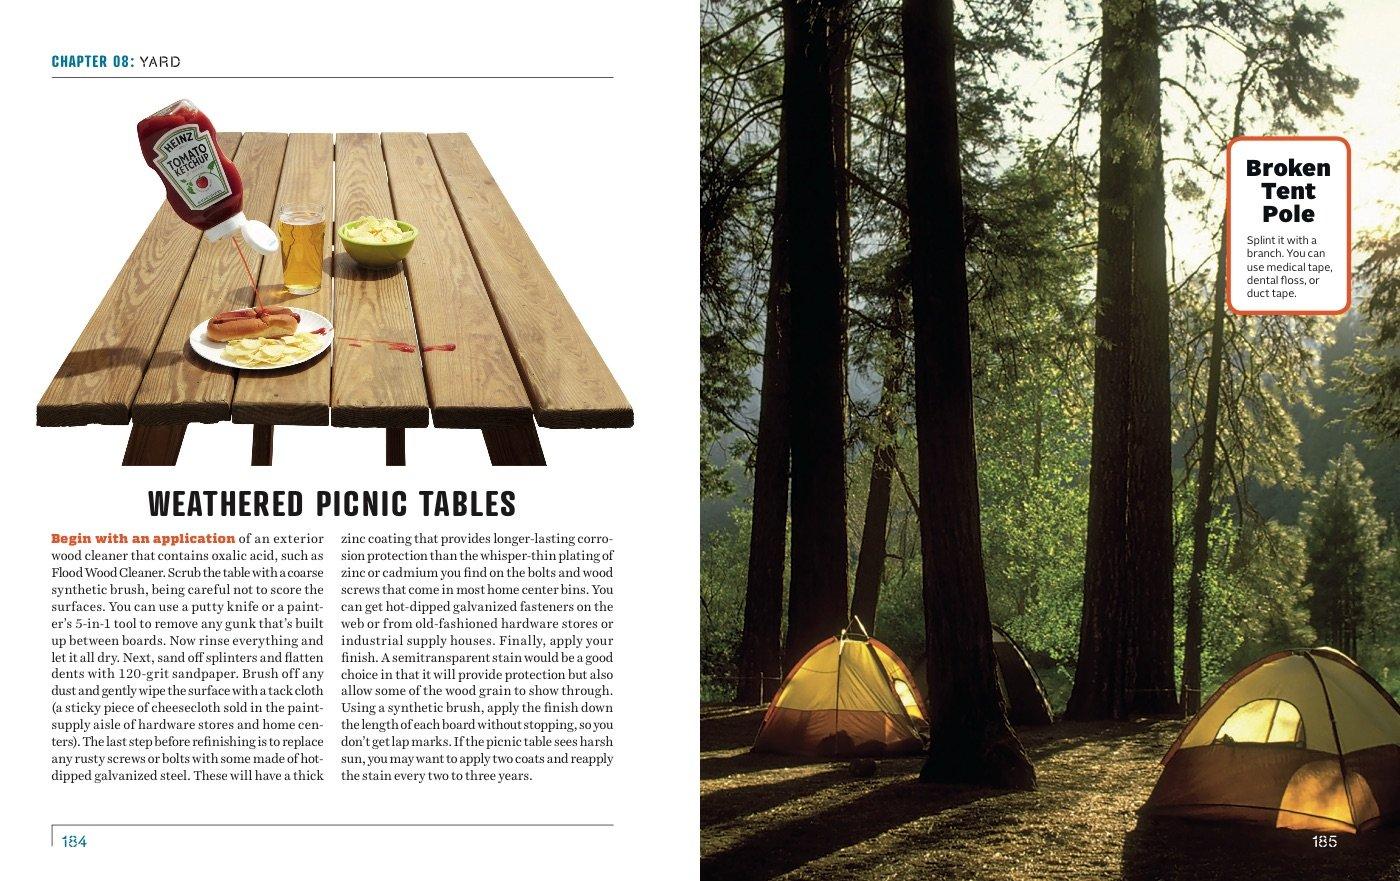 Popular Mechanics How To Fix Anything Essential Home Repairs Anyone - Popular mechanics picnic table